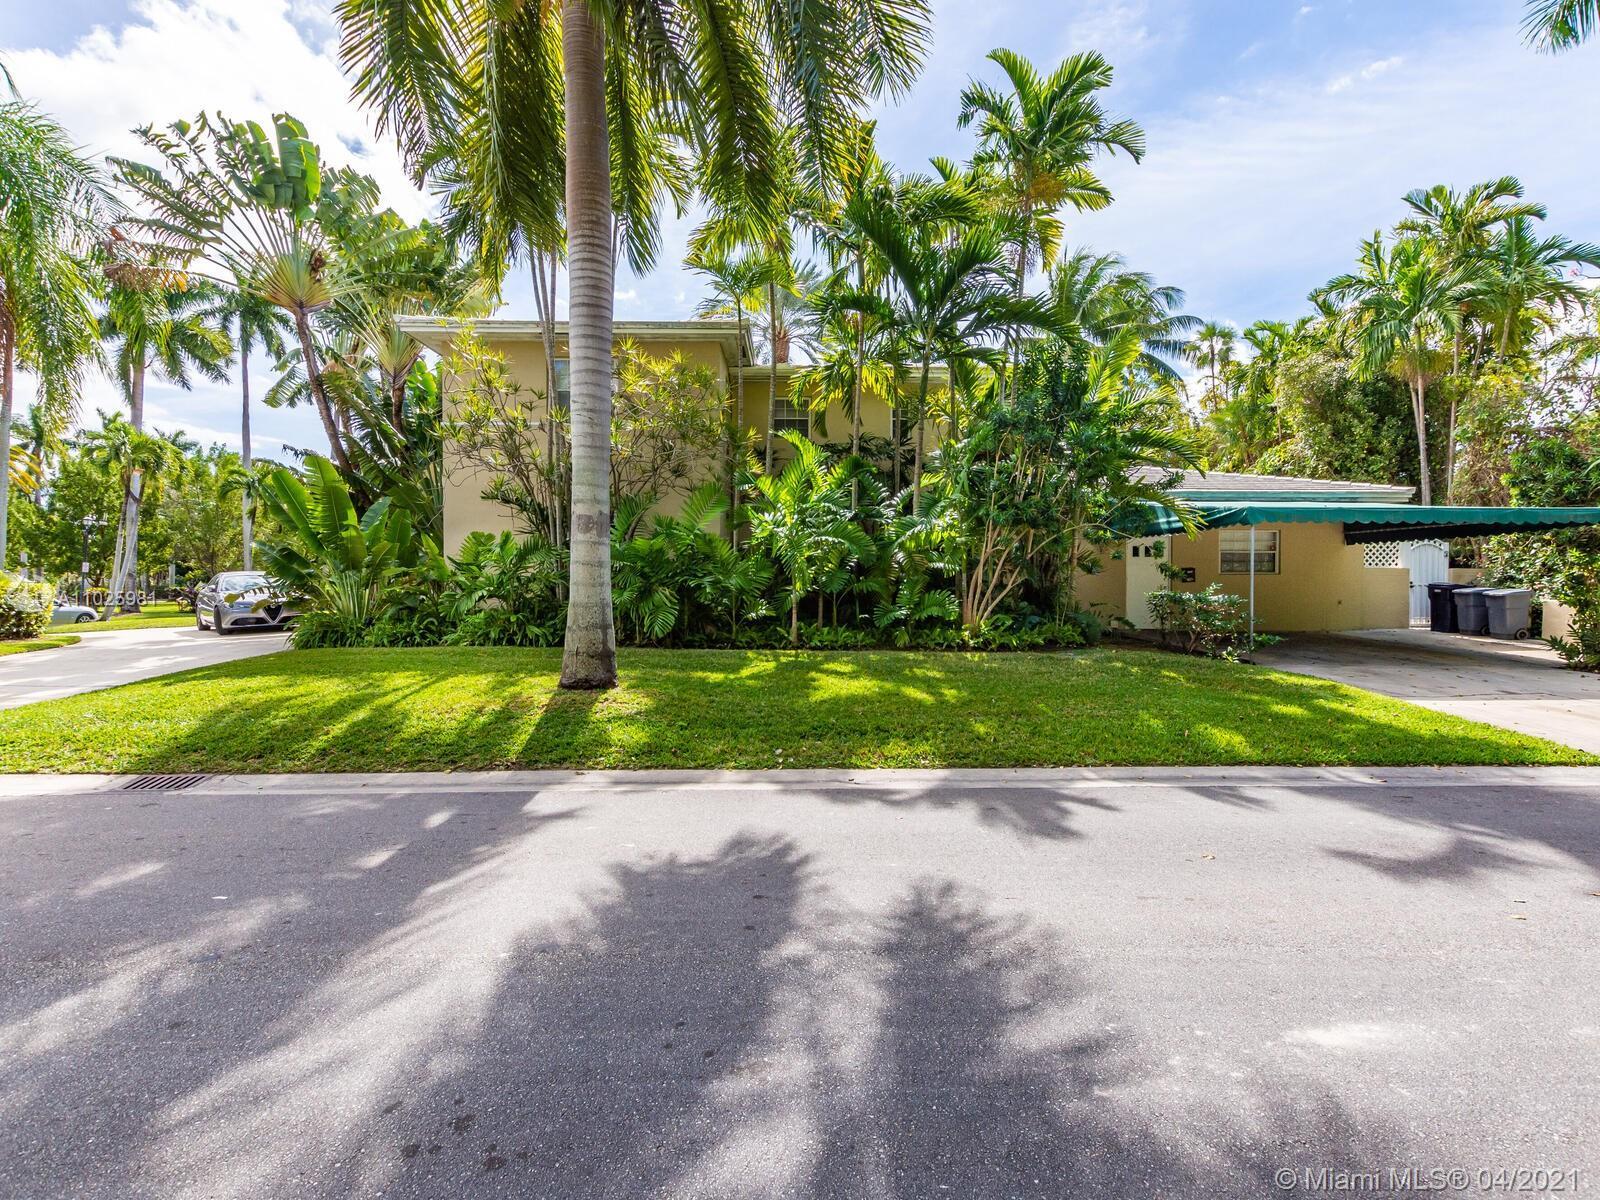 Sunset Islands, 2560 Sunset Dr, Mid-Beach, Florida 33140, image 96